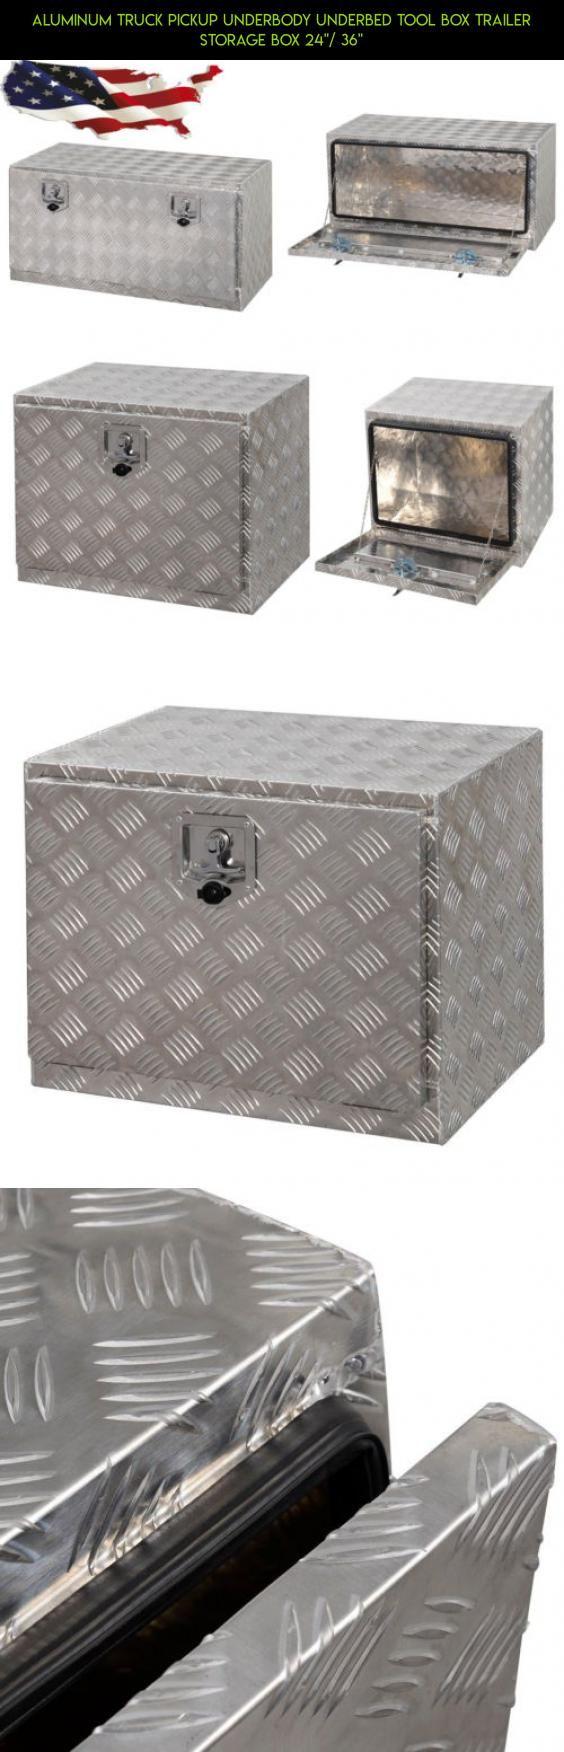 Aluminum truck pickup underbody underbed tool box trailer storage box 24 36